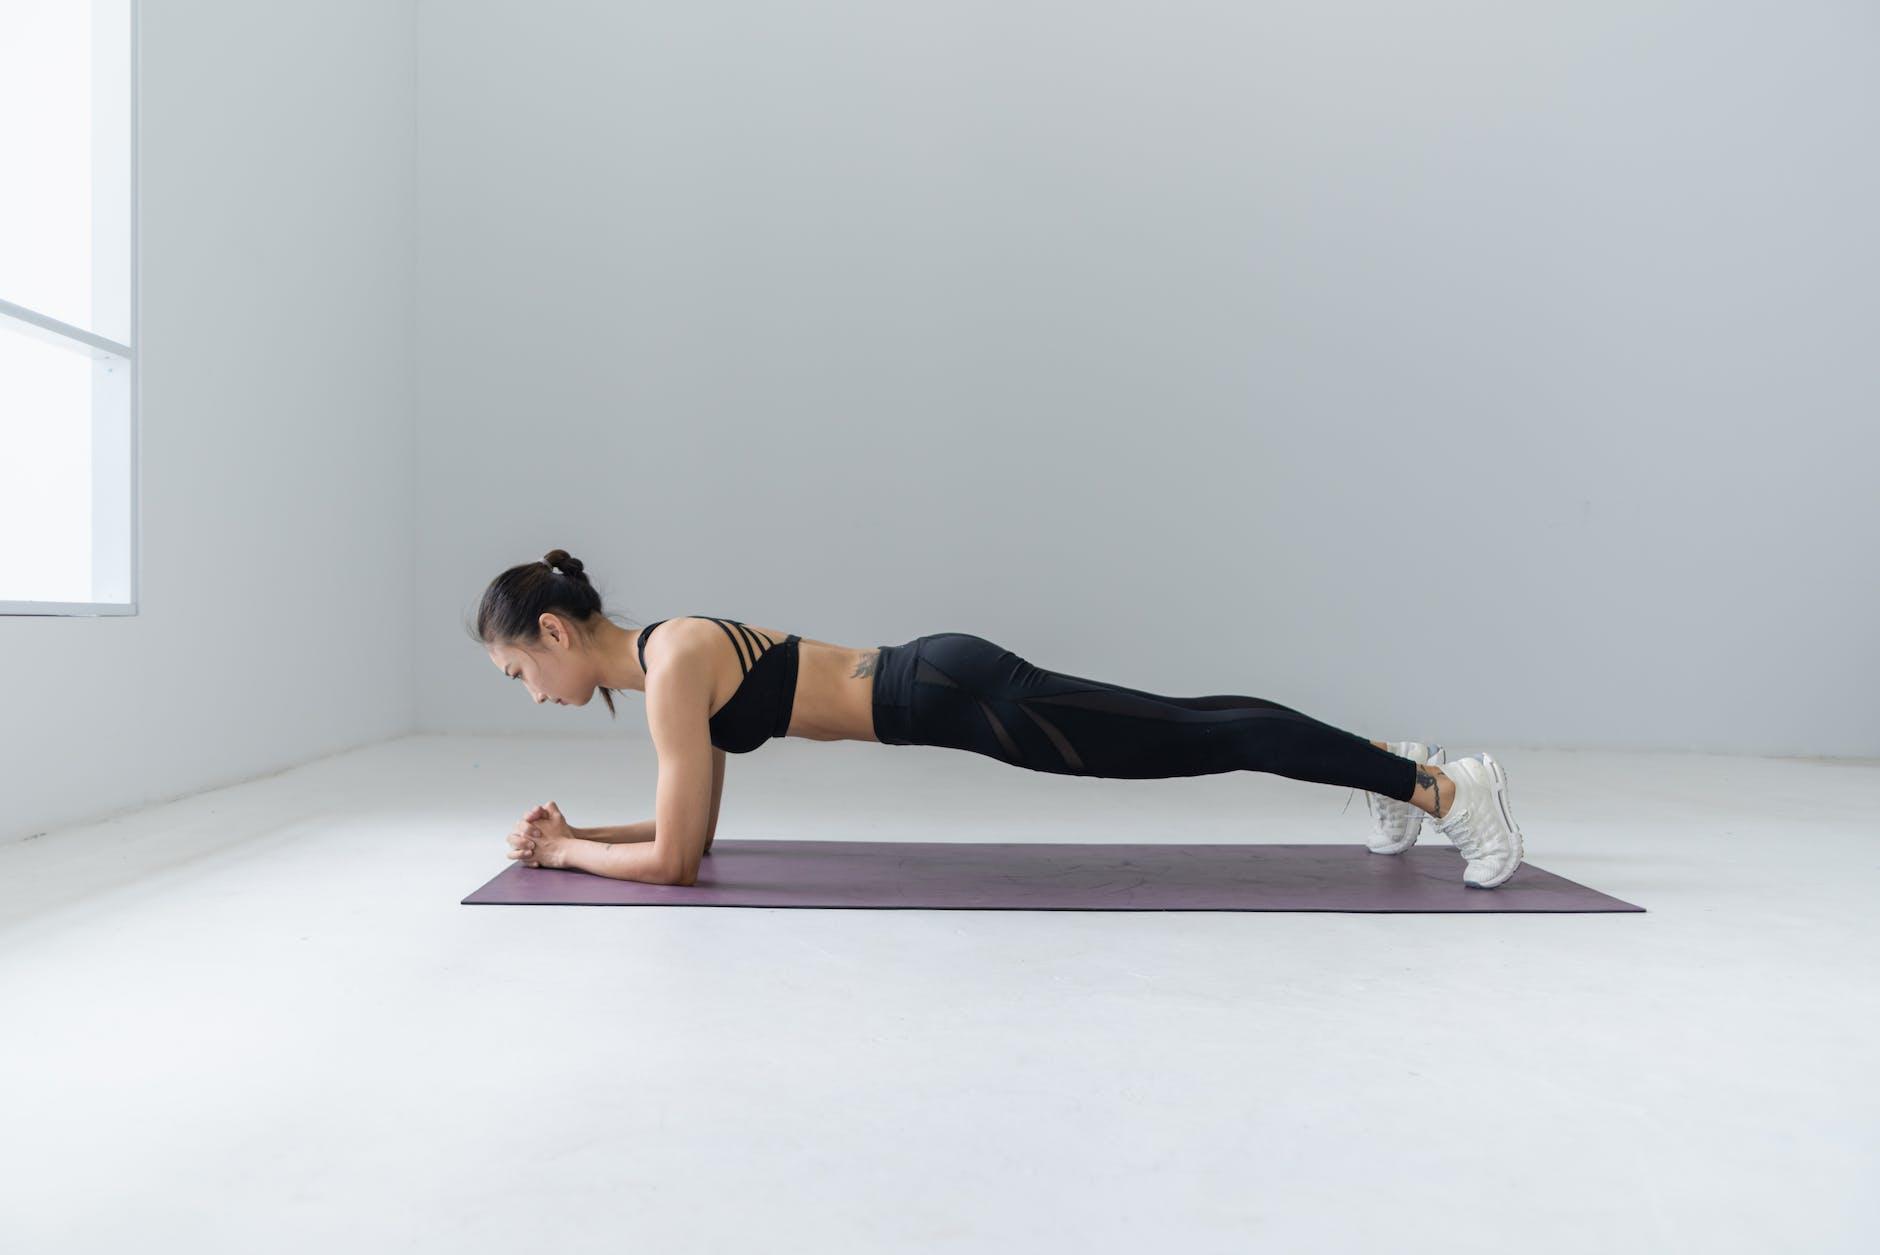 photo of woman doing yoga